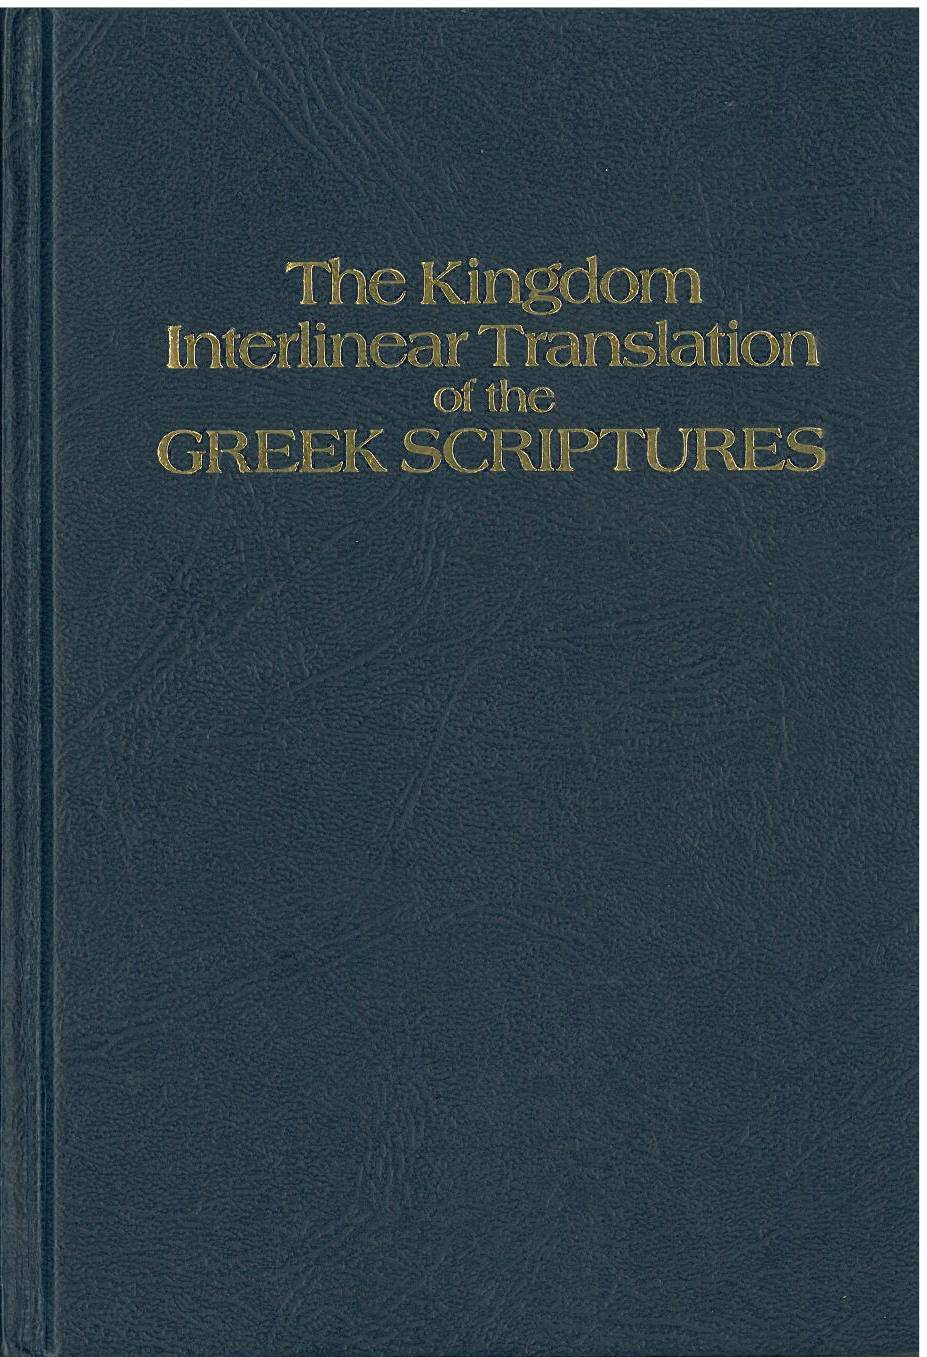 Kingdom Interlinear Translation - Internet Bible Catalog